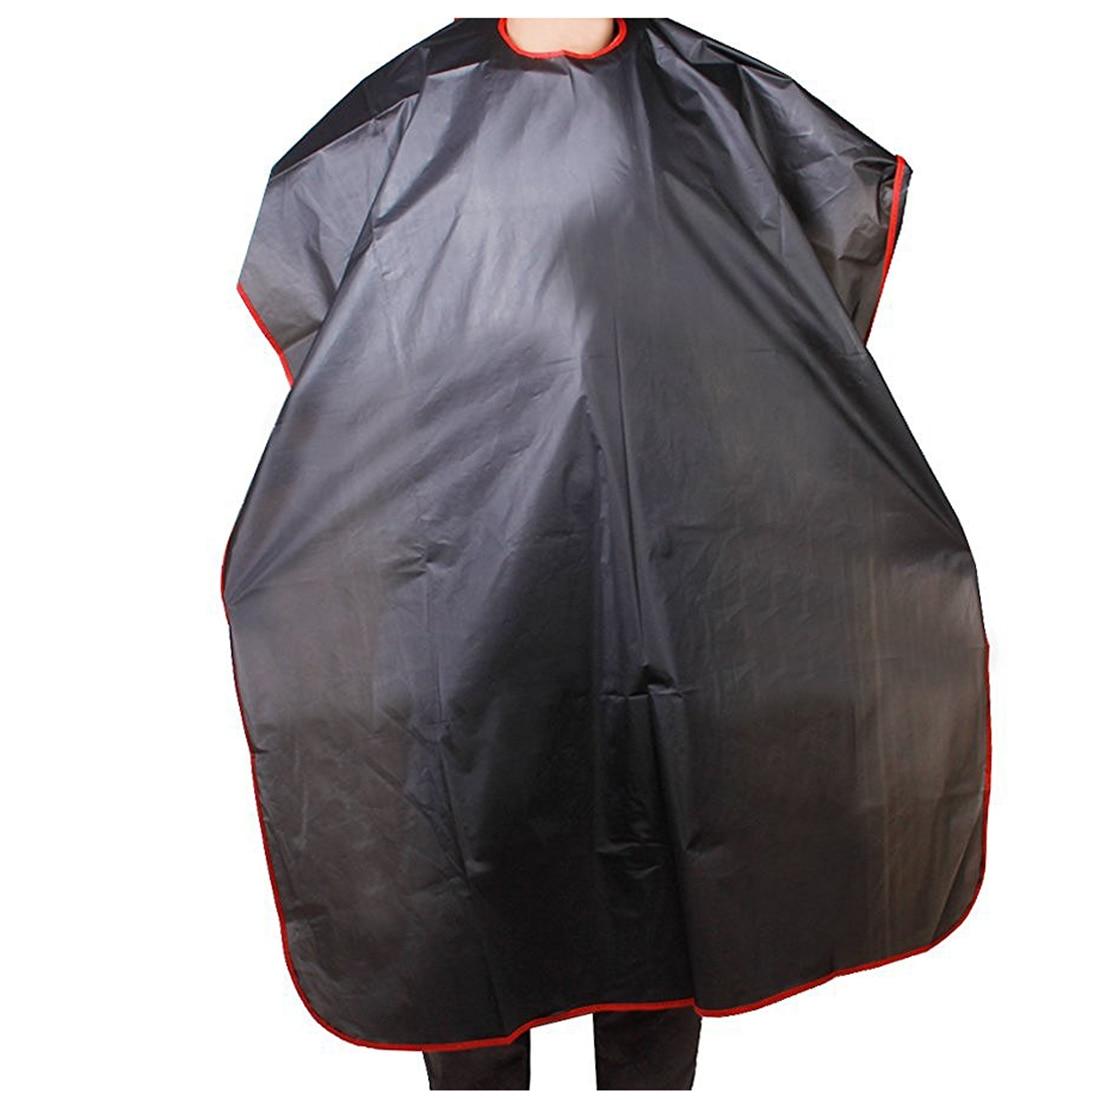 YOST-delantal de blusa de peluquería para salón de peluquería 125x 95cm